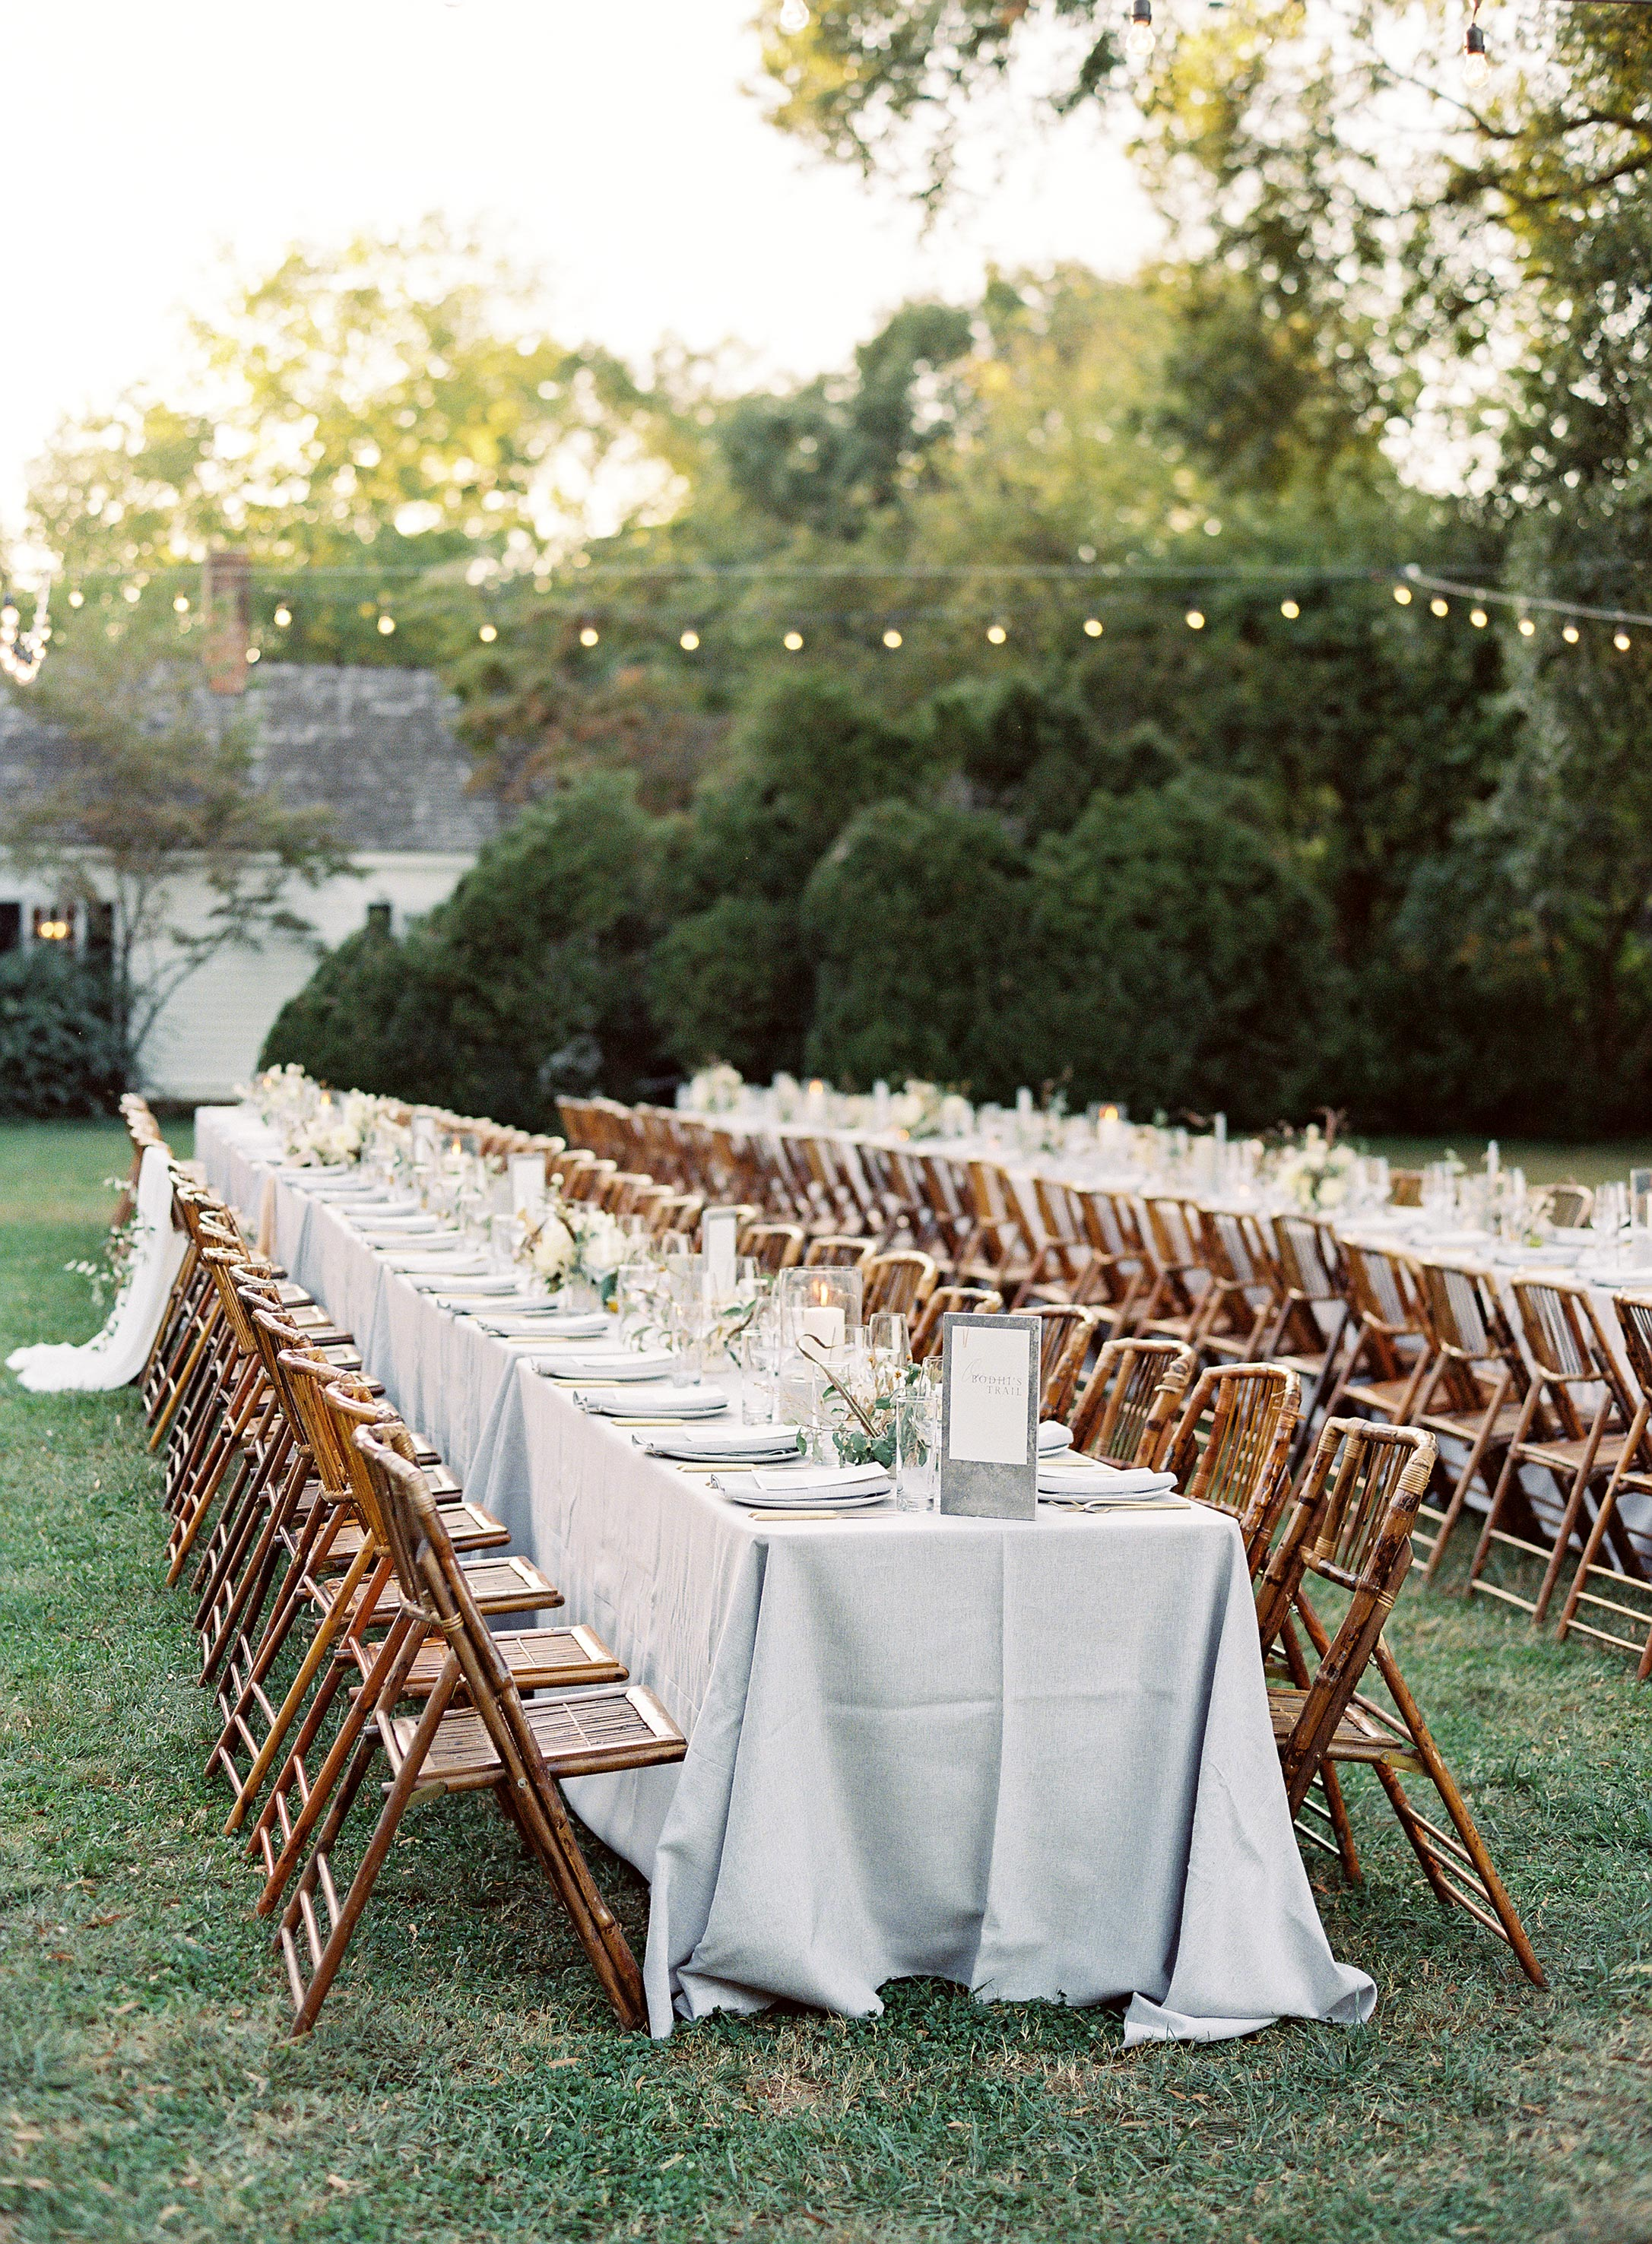 linda robert wedding reception table setting